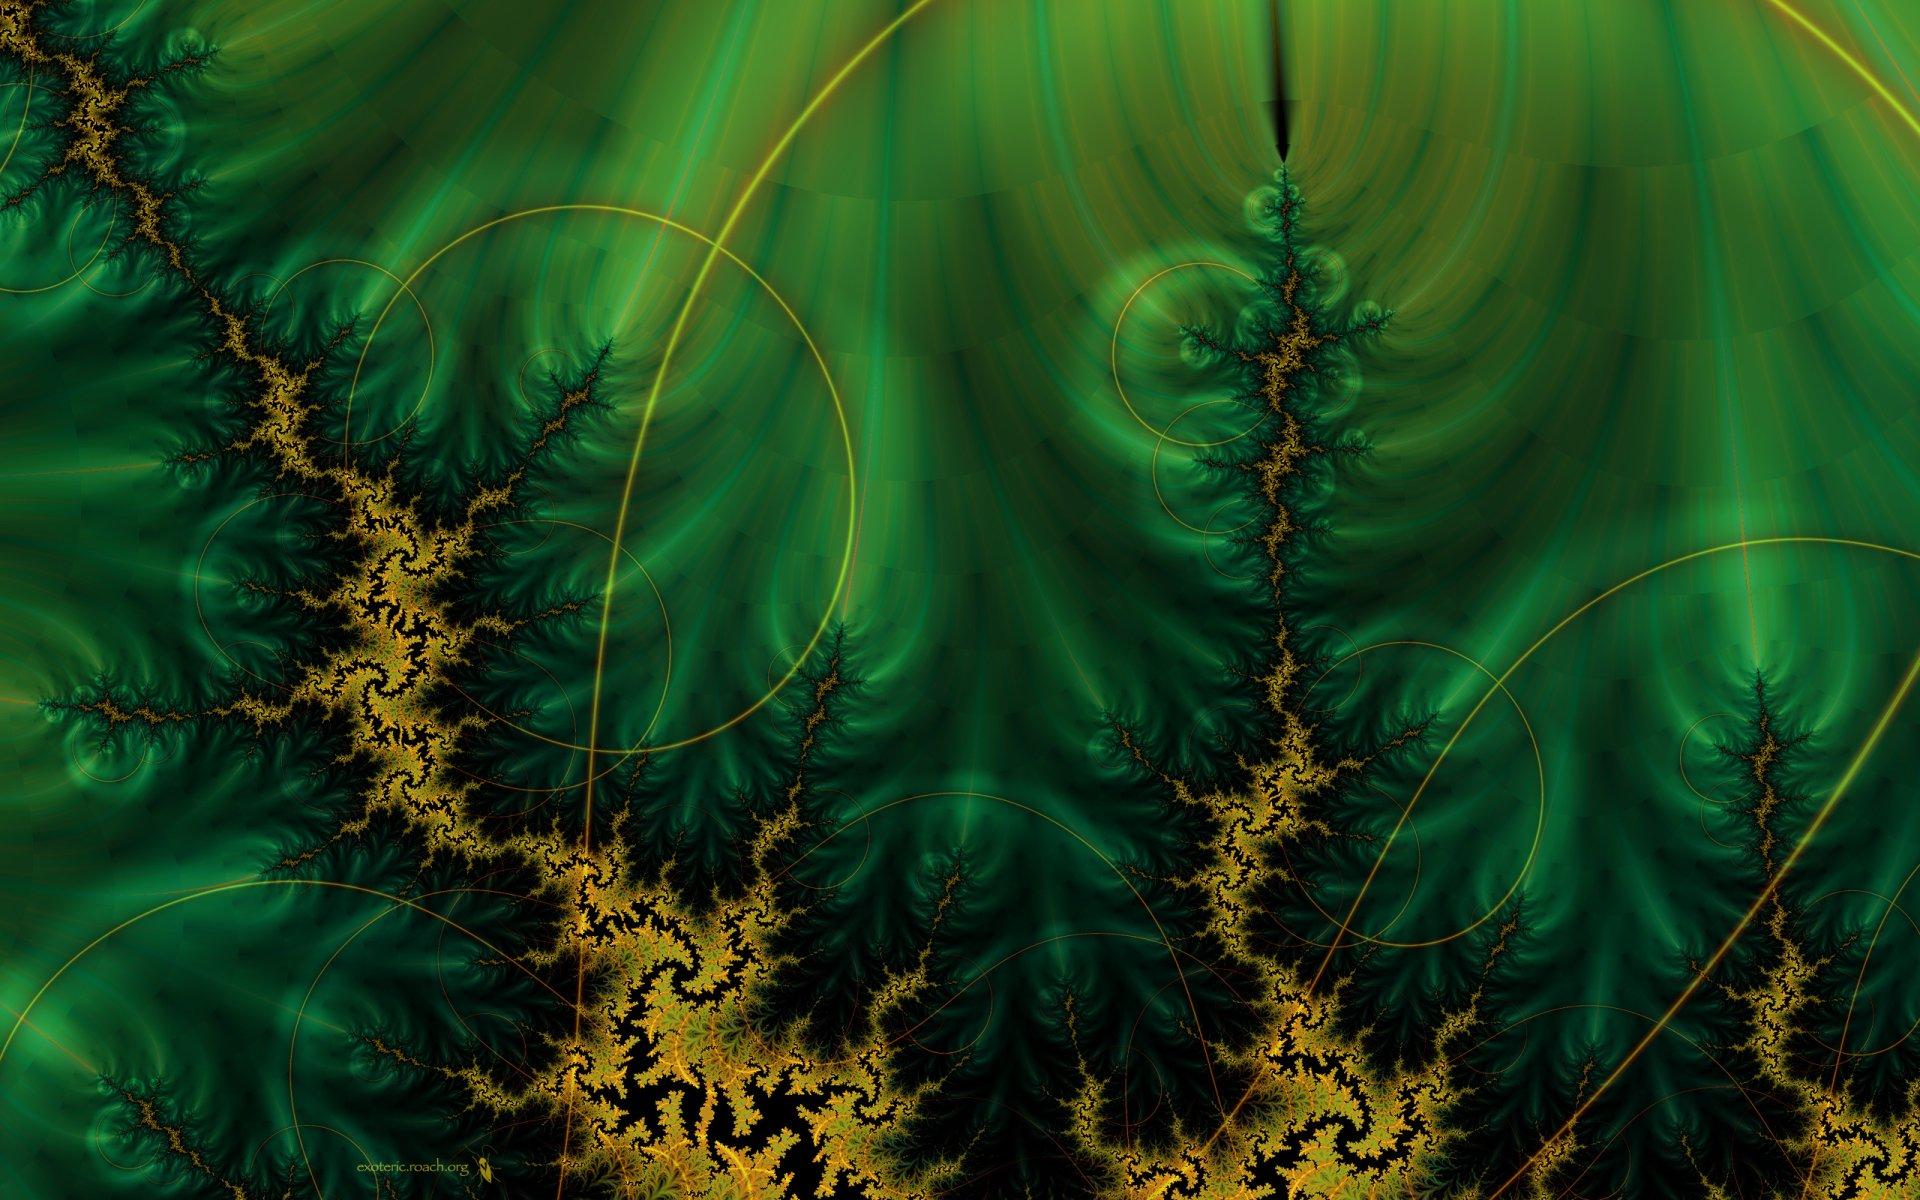 Abstracto - Fractal  Digital Abstracto Fondo de Pantalla